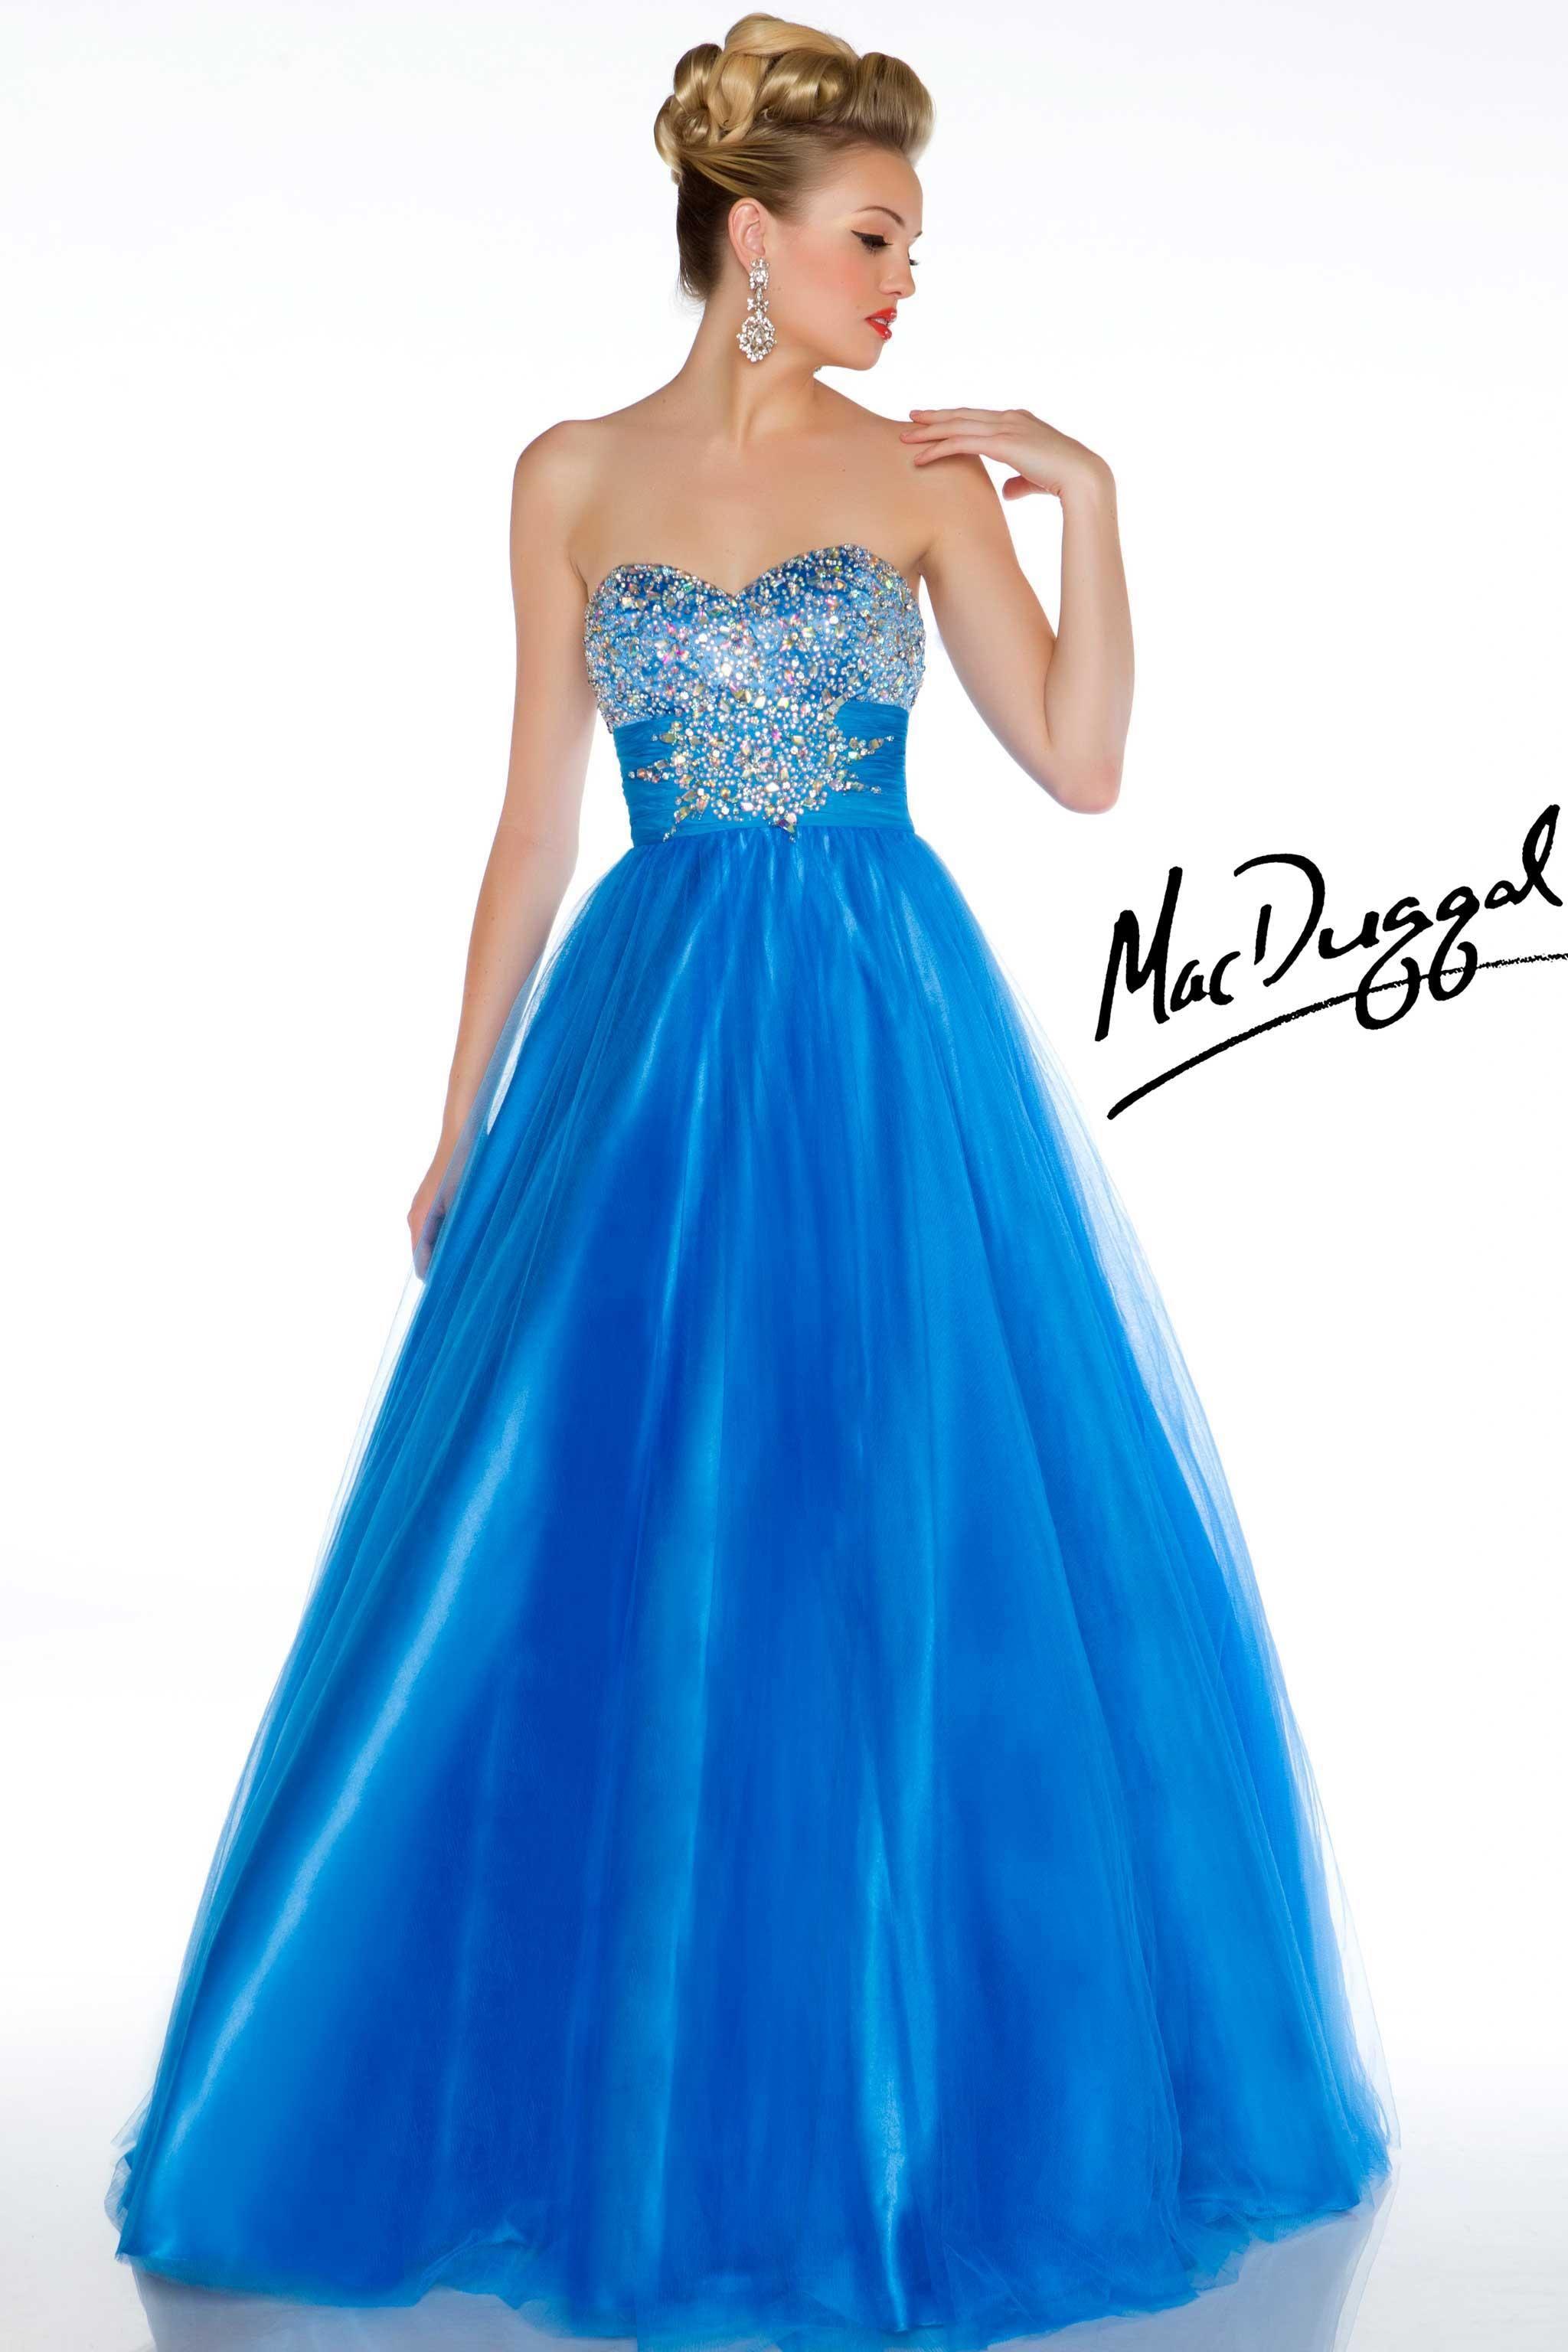 Fresh Blue Ball Gown Mac Duggal 81757 H   Fancy attire<3   Pinterest ...